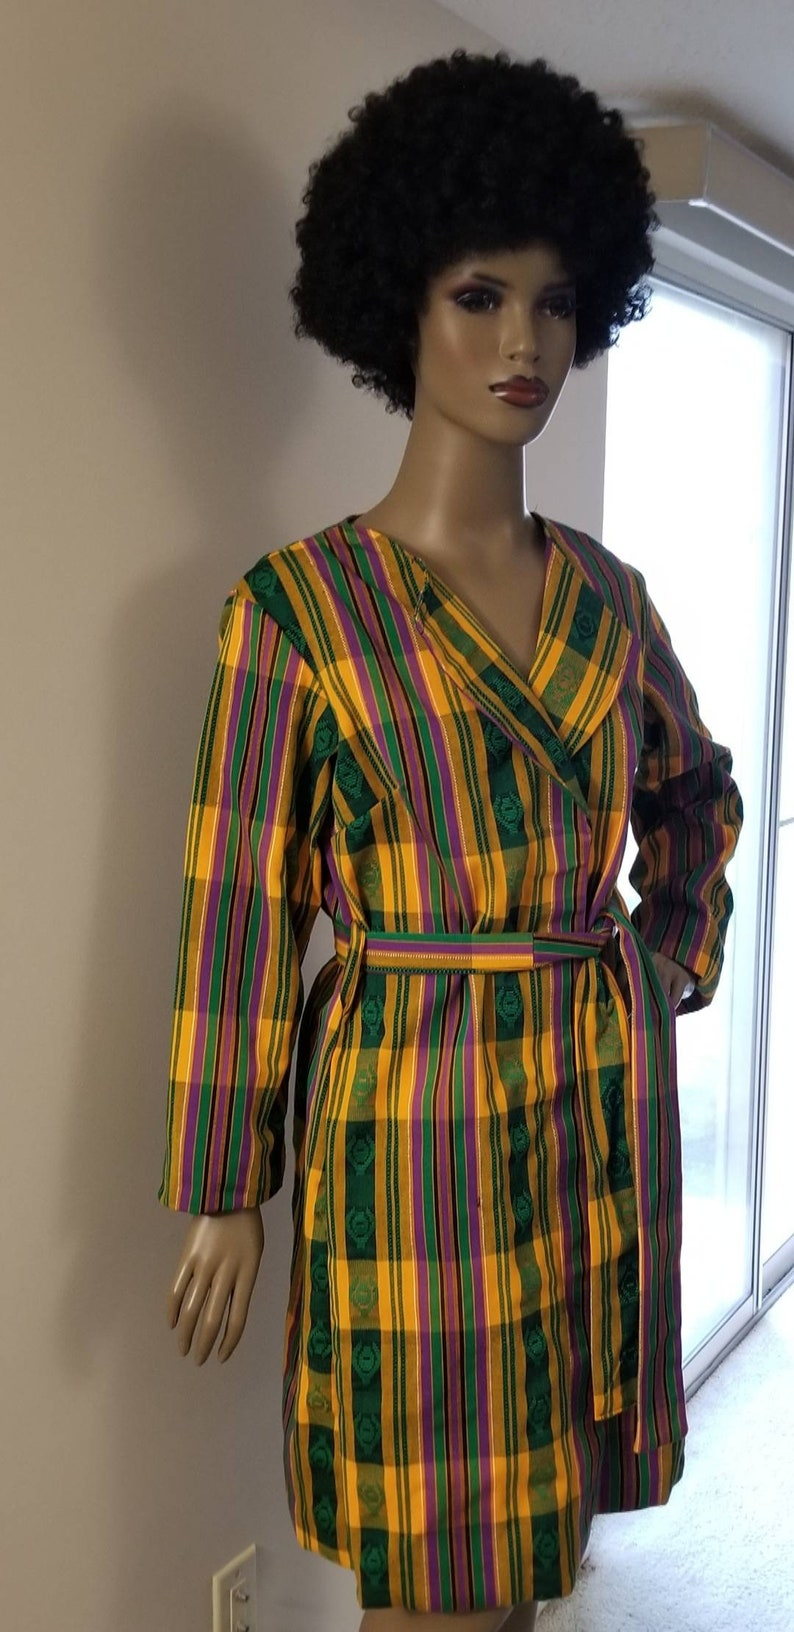 Authentic Ghanaian Kente Jacket Woven Kente Jacket Ladies Kente Jacket.